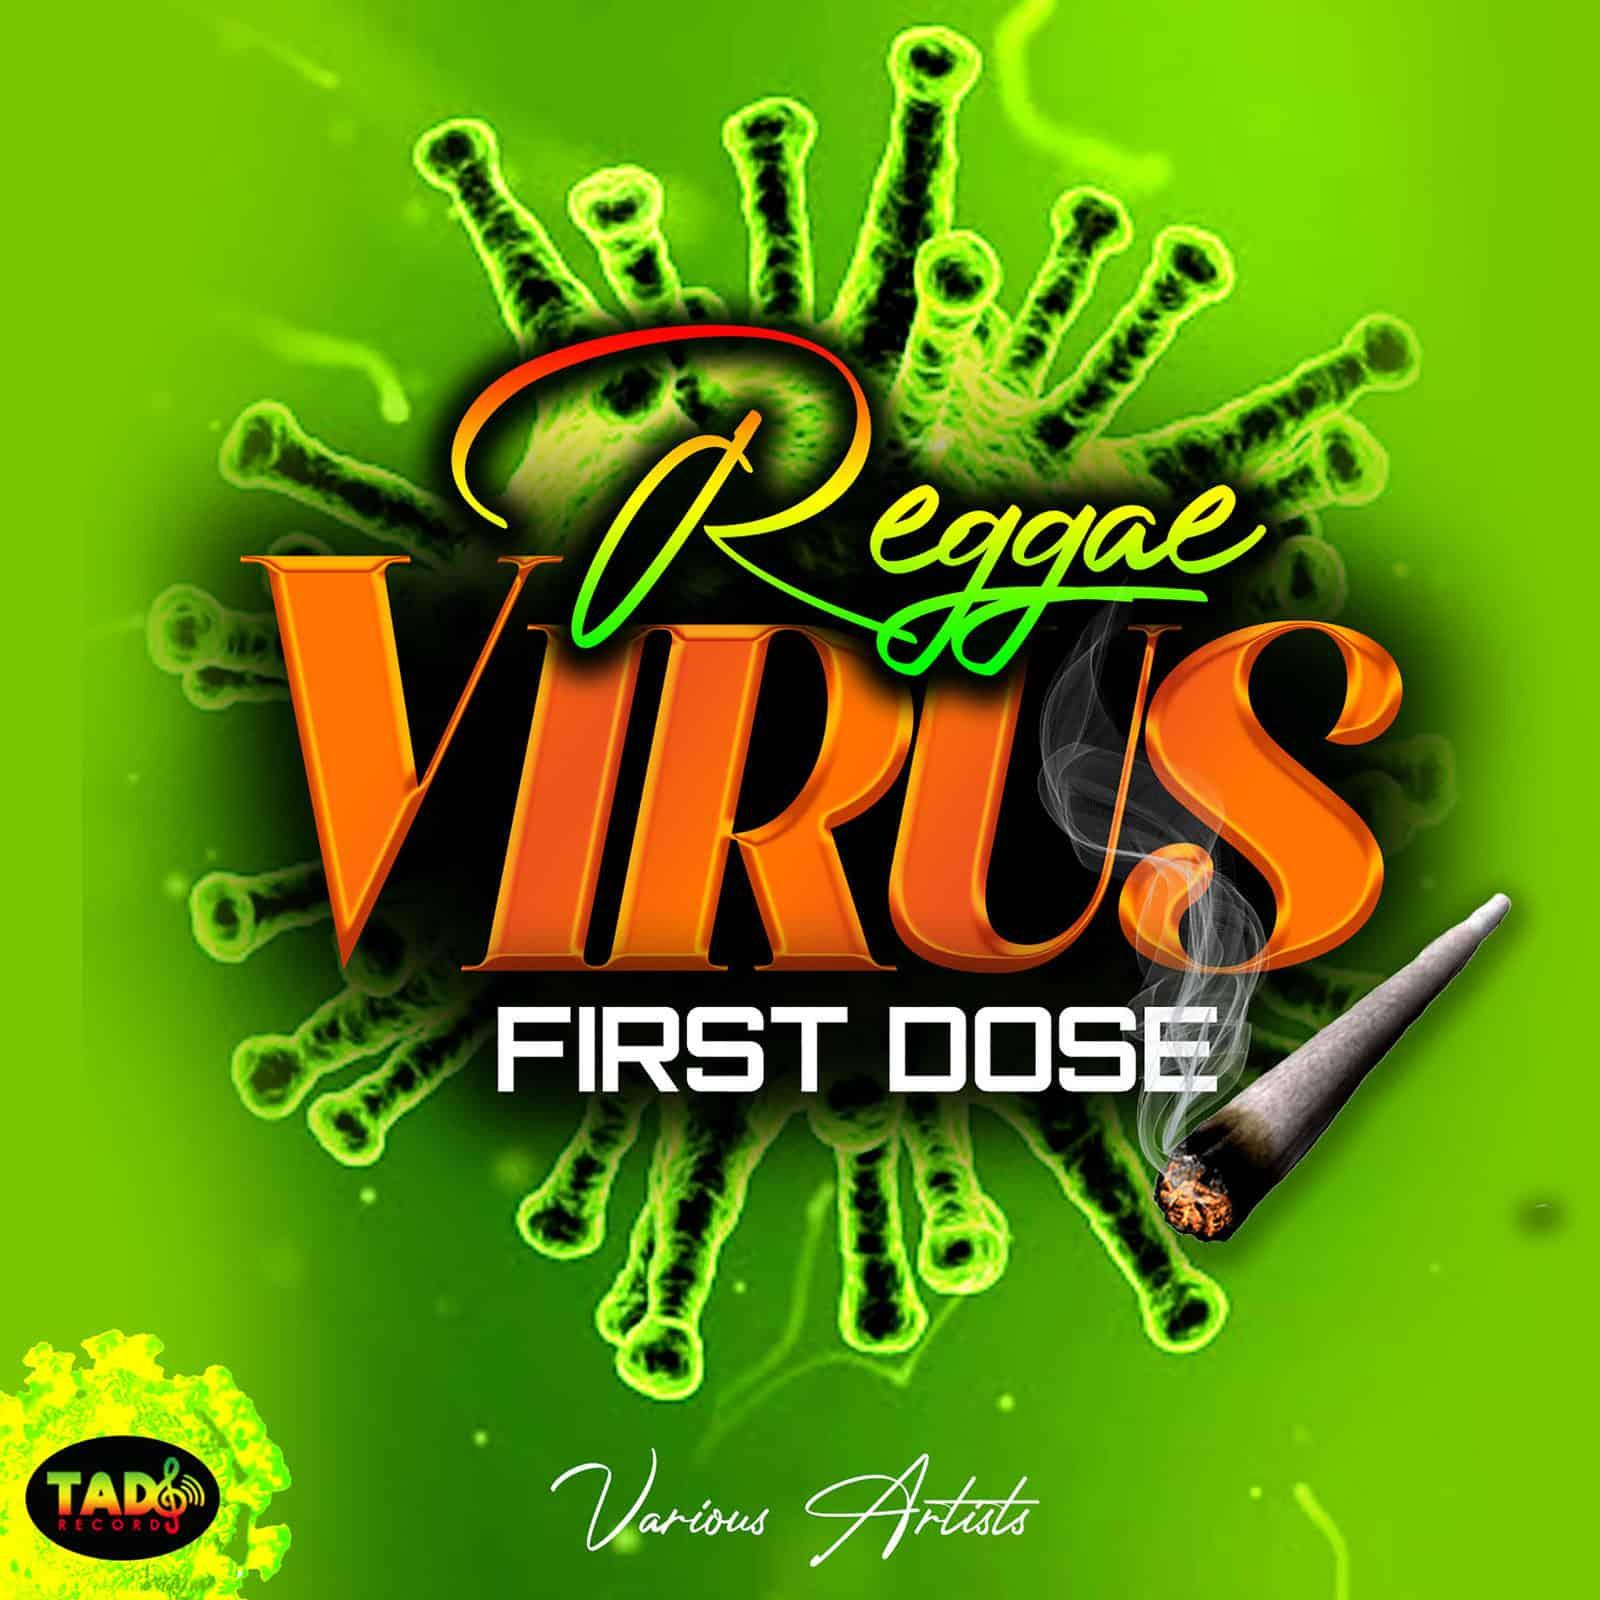 Reggae Virus - First Dose -Tad